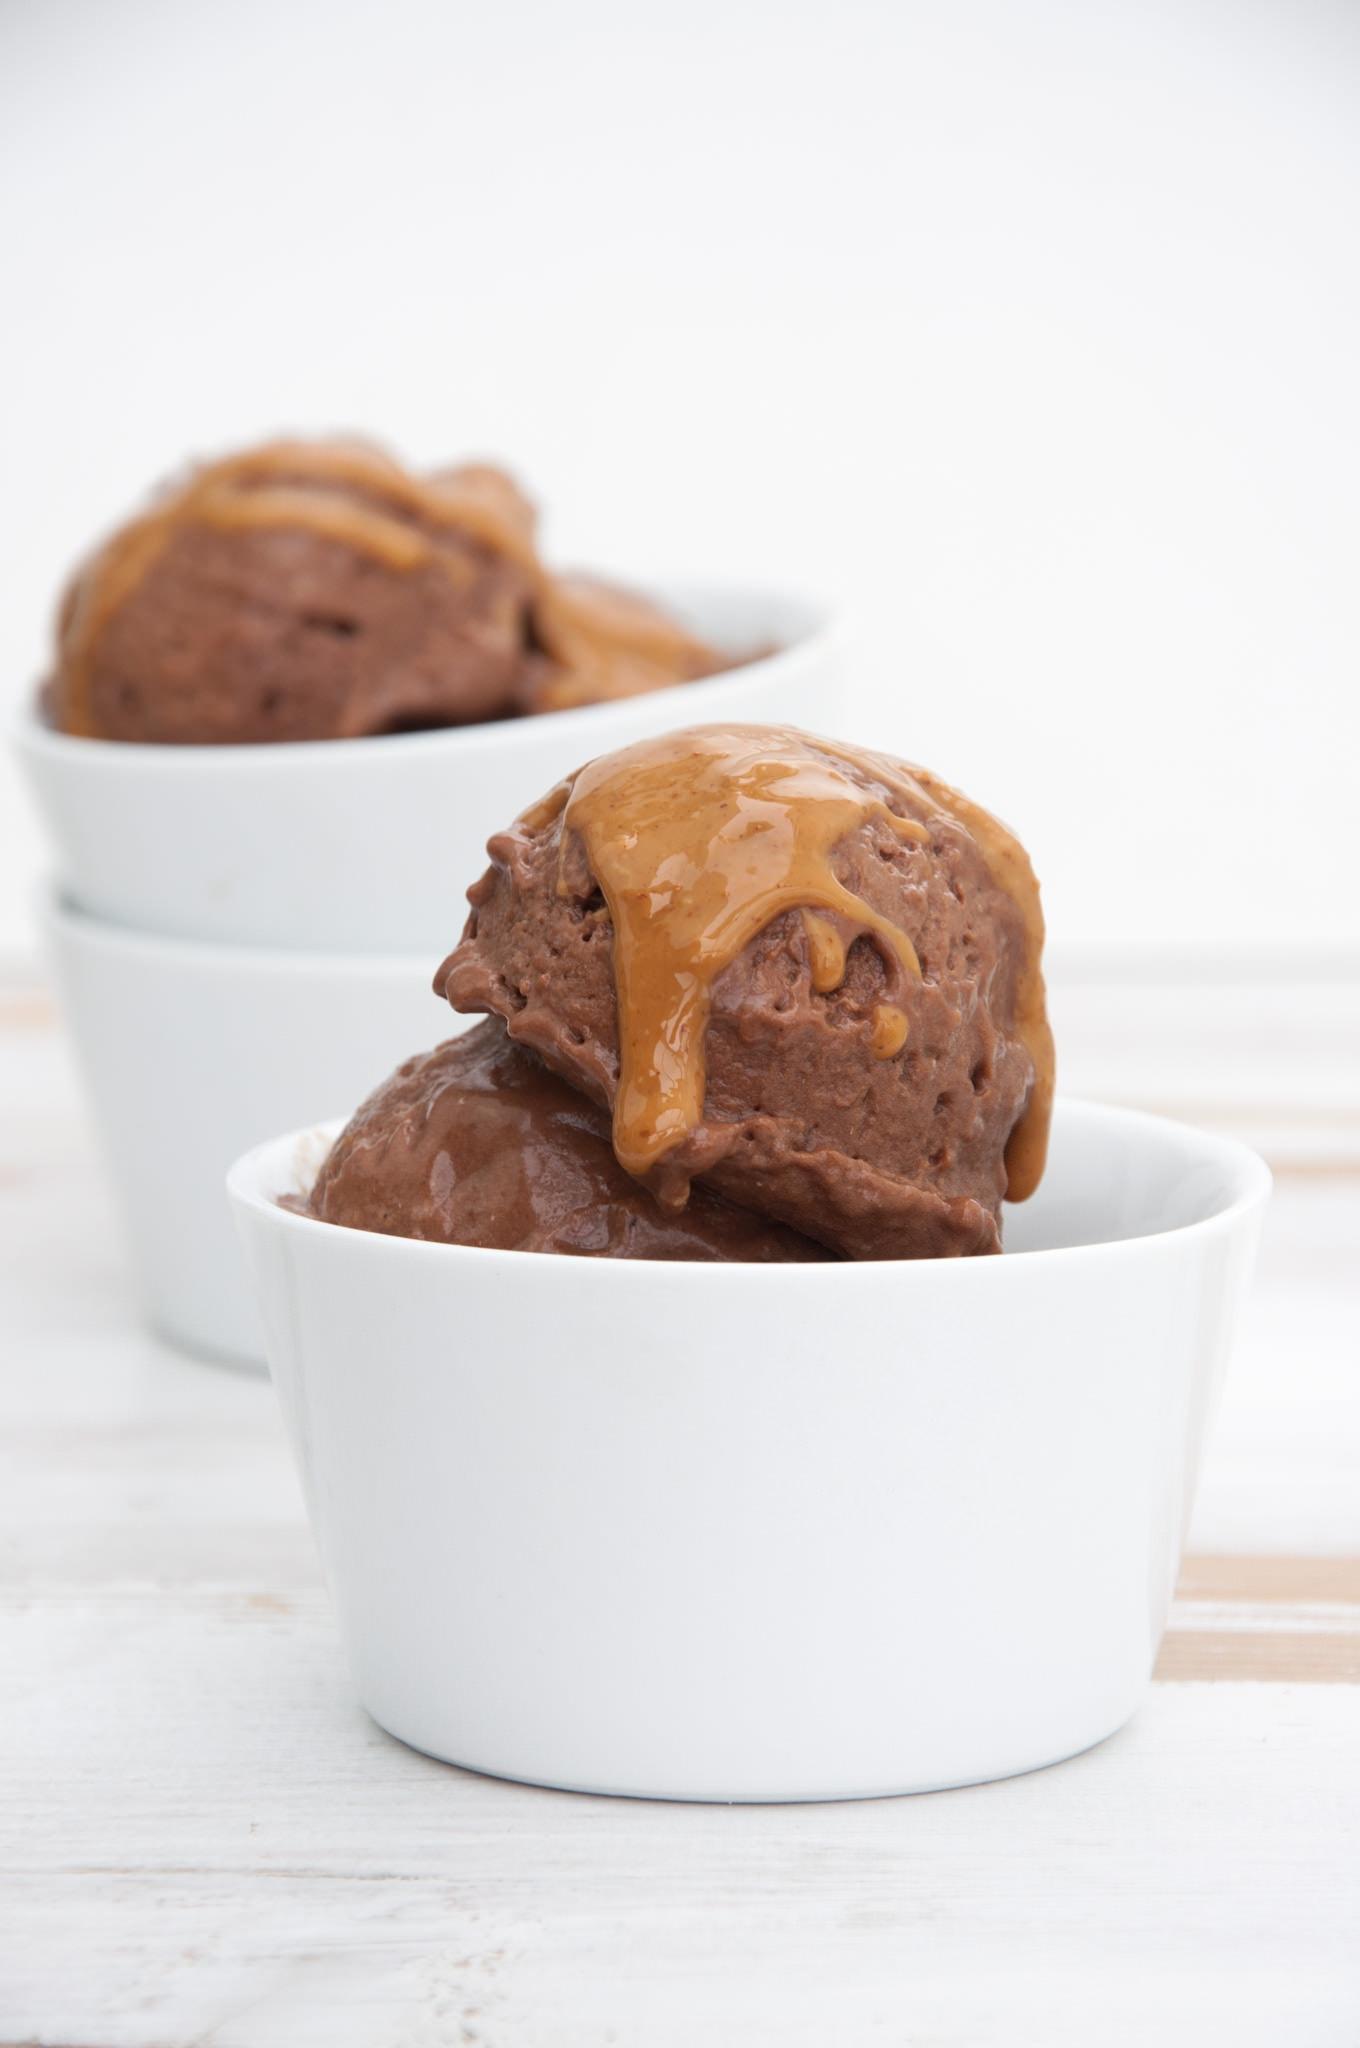 Vegan Chocolate Peanut Butter Ice Cream